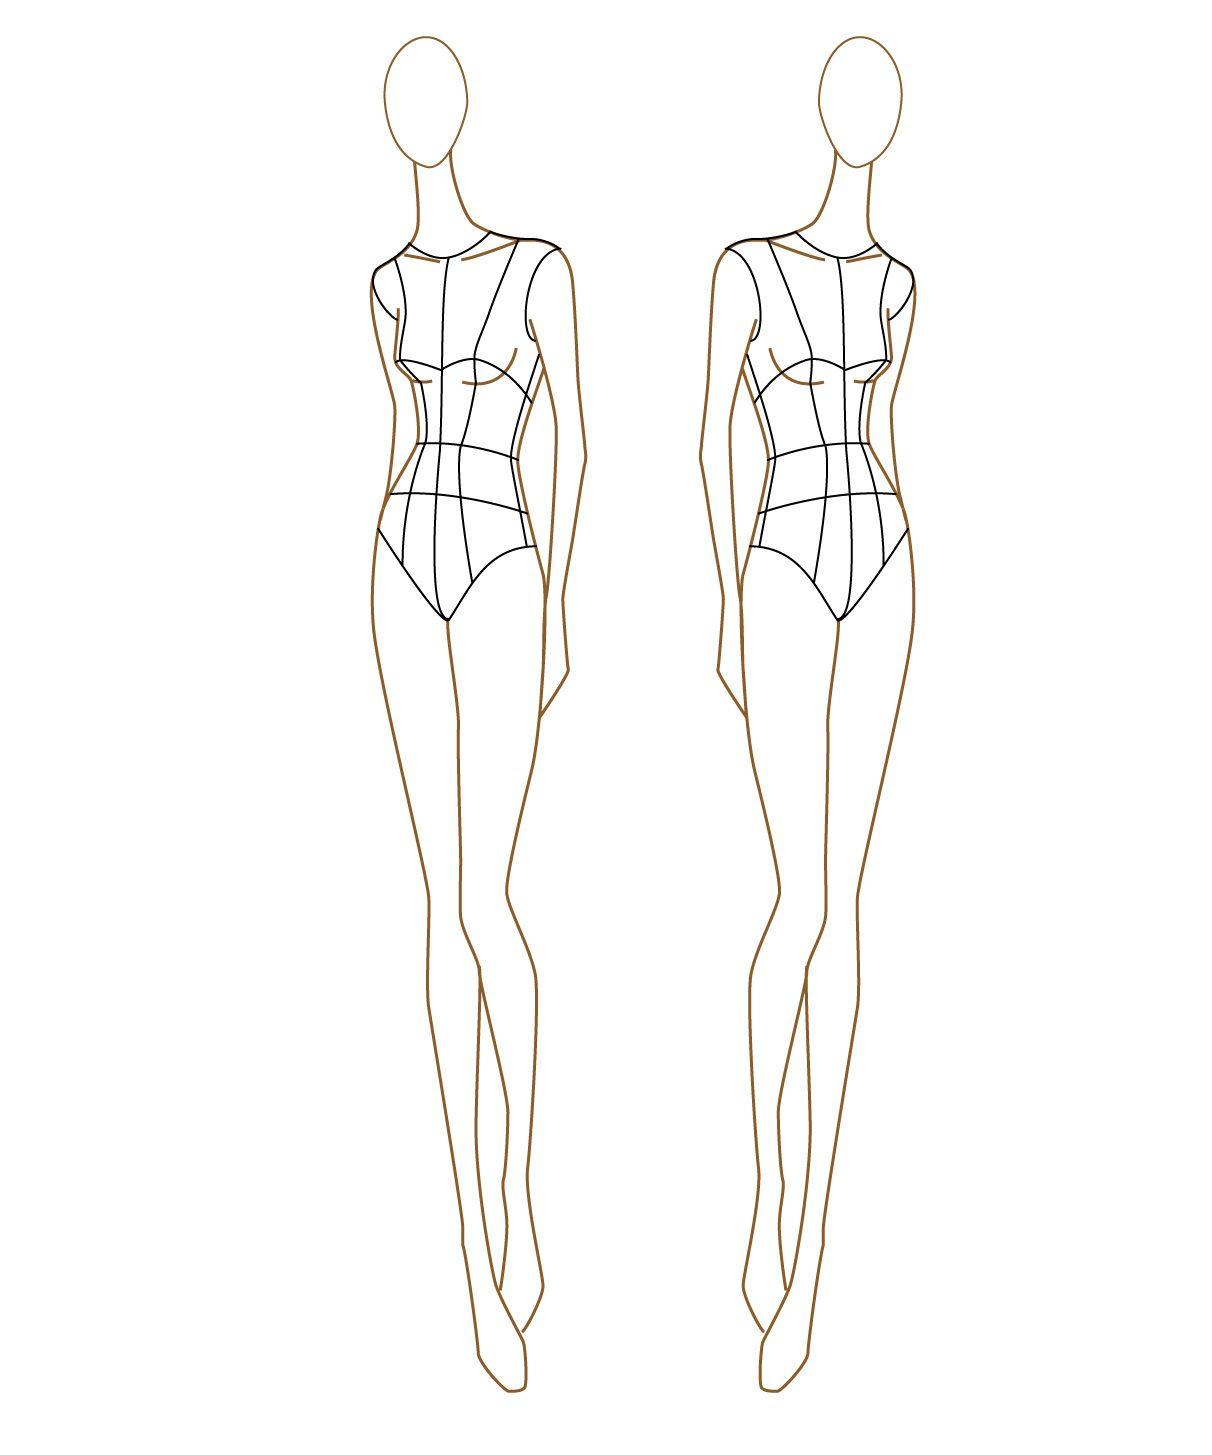 Template For Fashion Design Figures Fashion Design Templates